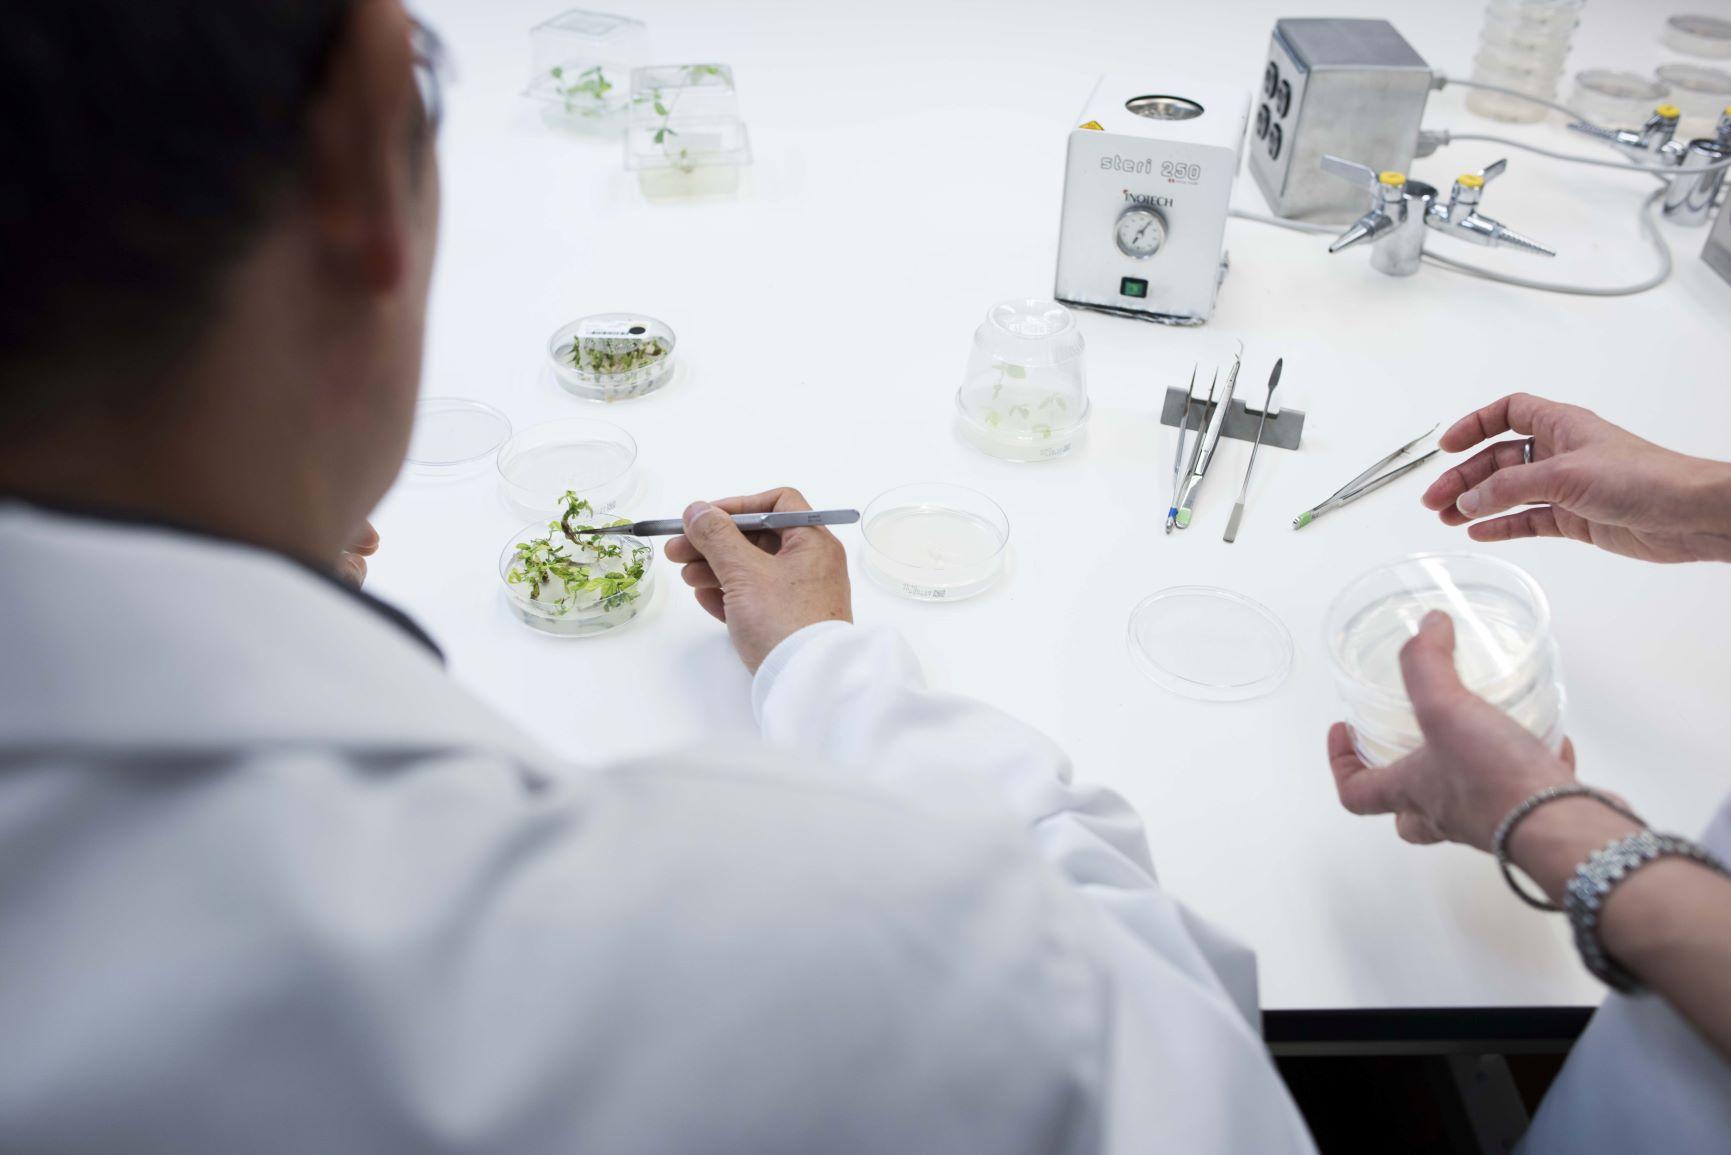 Biotech Innovation at Risk?